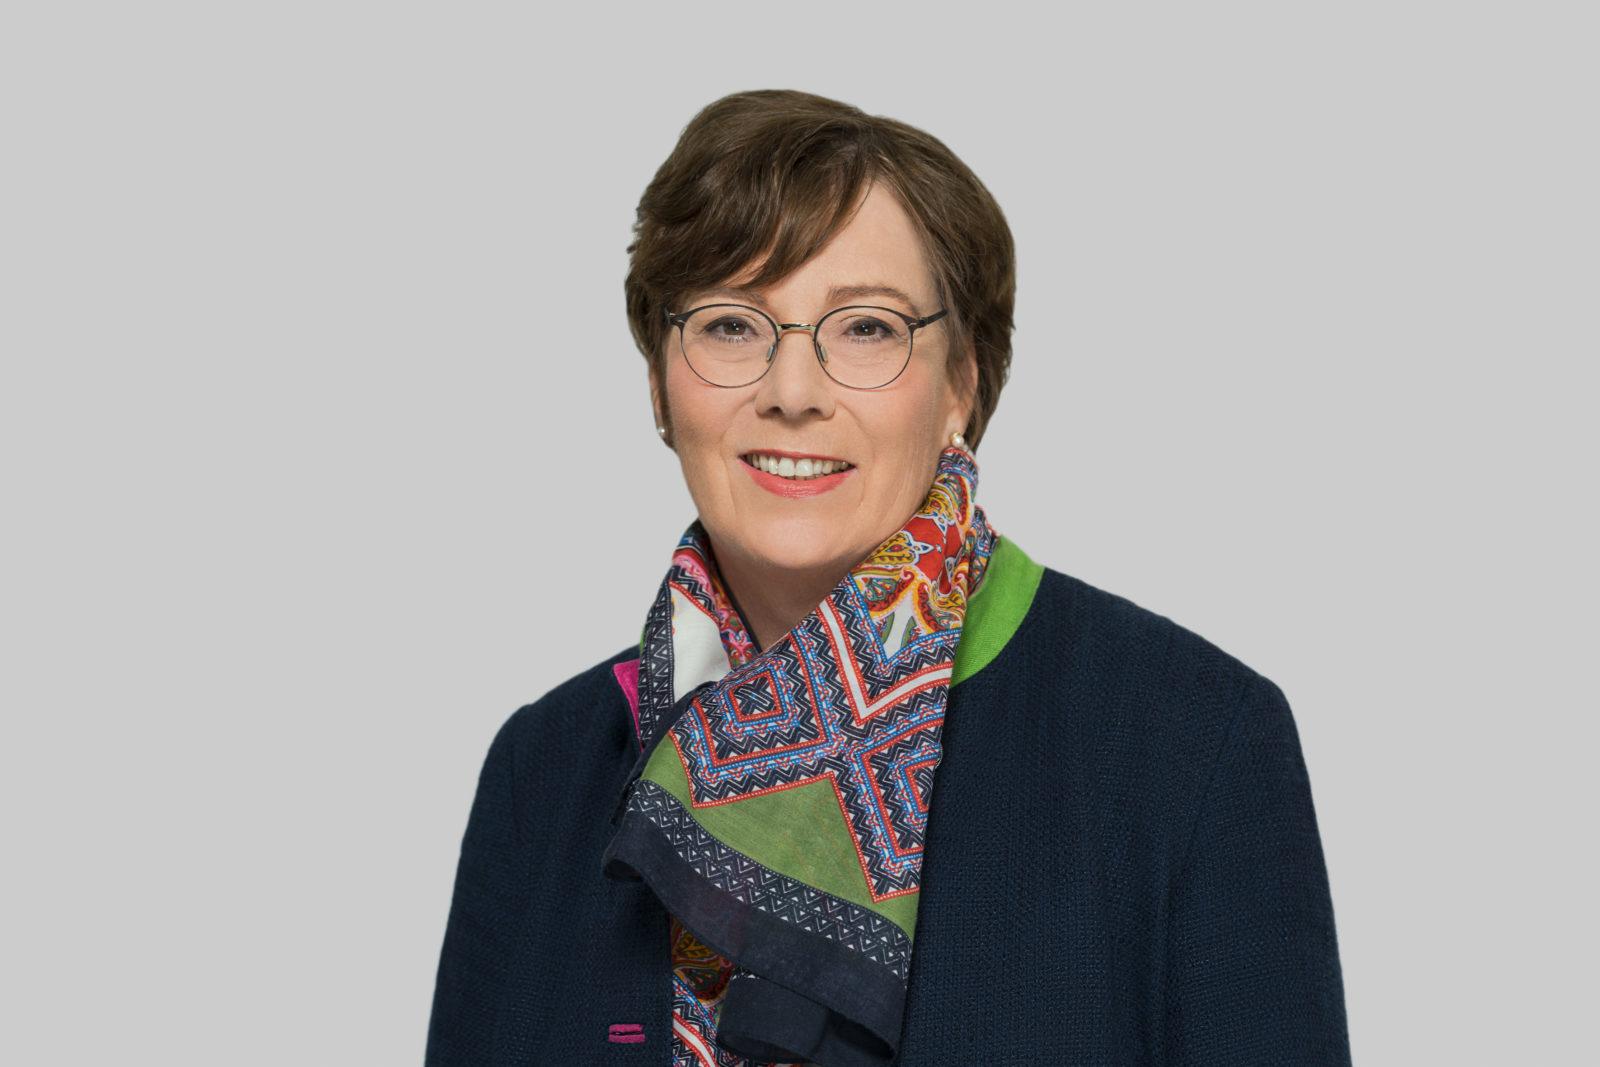 Dr. Sabine Sütterlin-Waack. Photographer: Frank Peter.